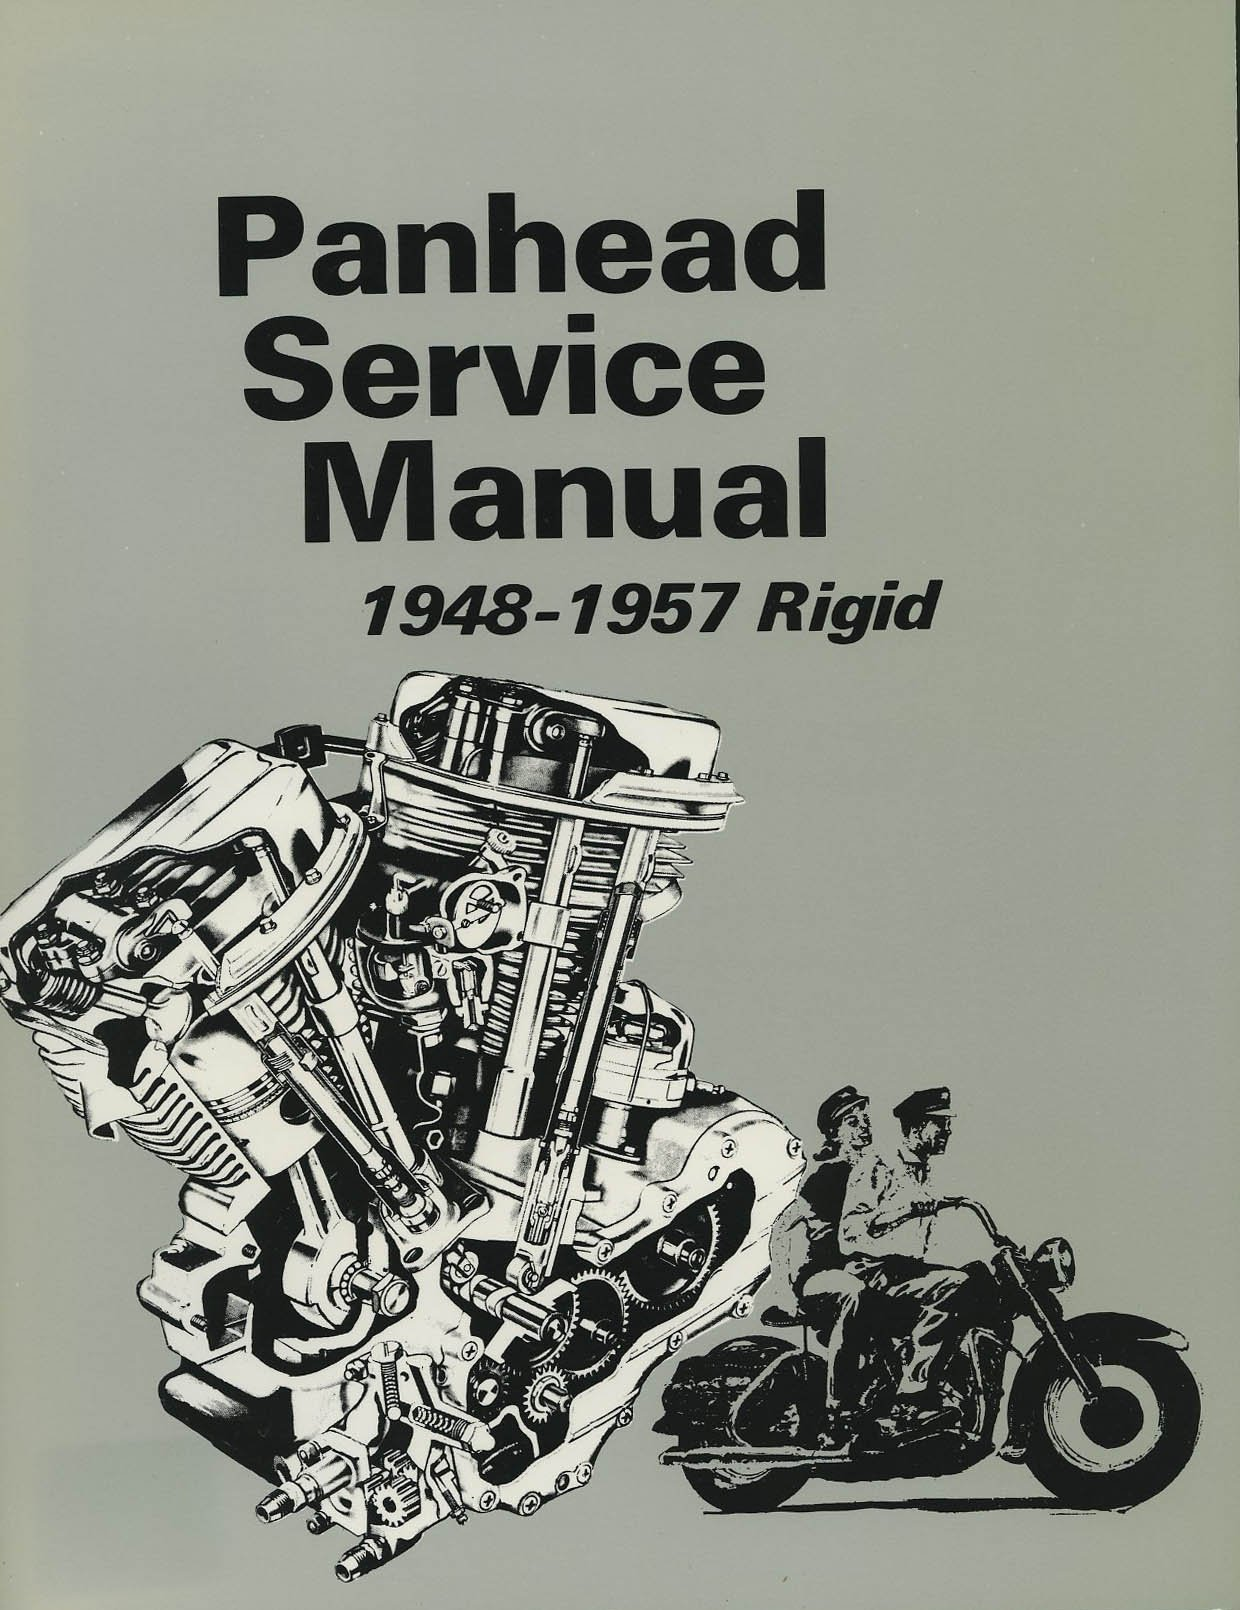 Harley-Davidson Panhead Service Manual 1948-1957 Rigid: T. Noel:  Amazon.com: Books